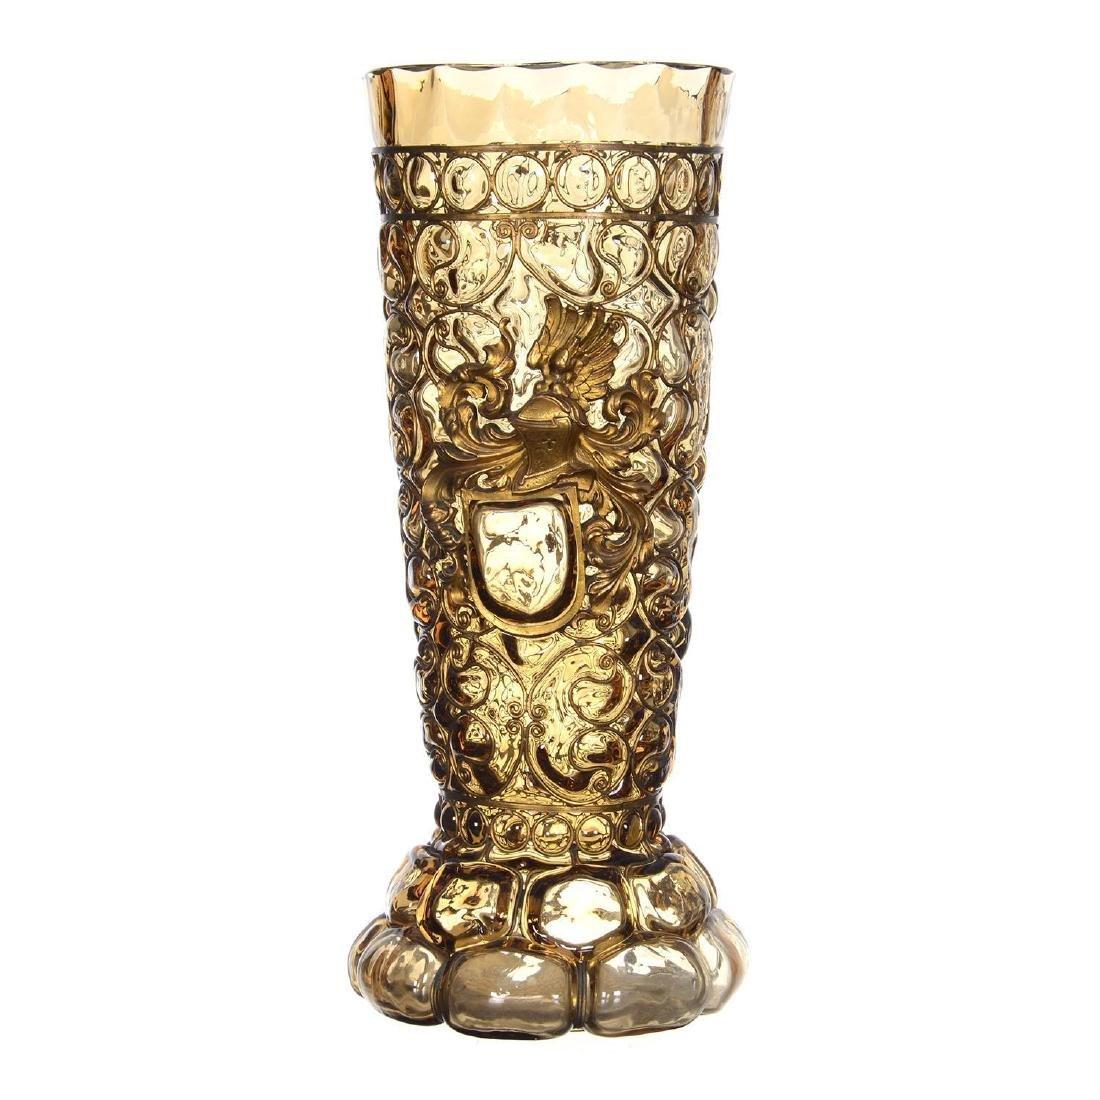 "12.25"" Art Glass Vase W/ Metal Overlay Highlights"